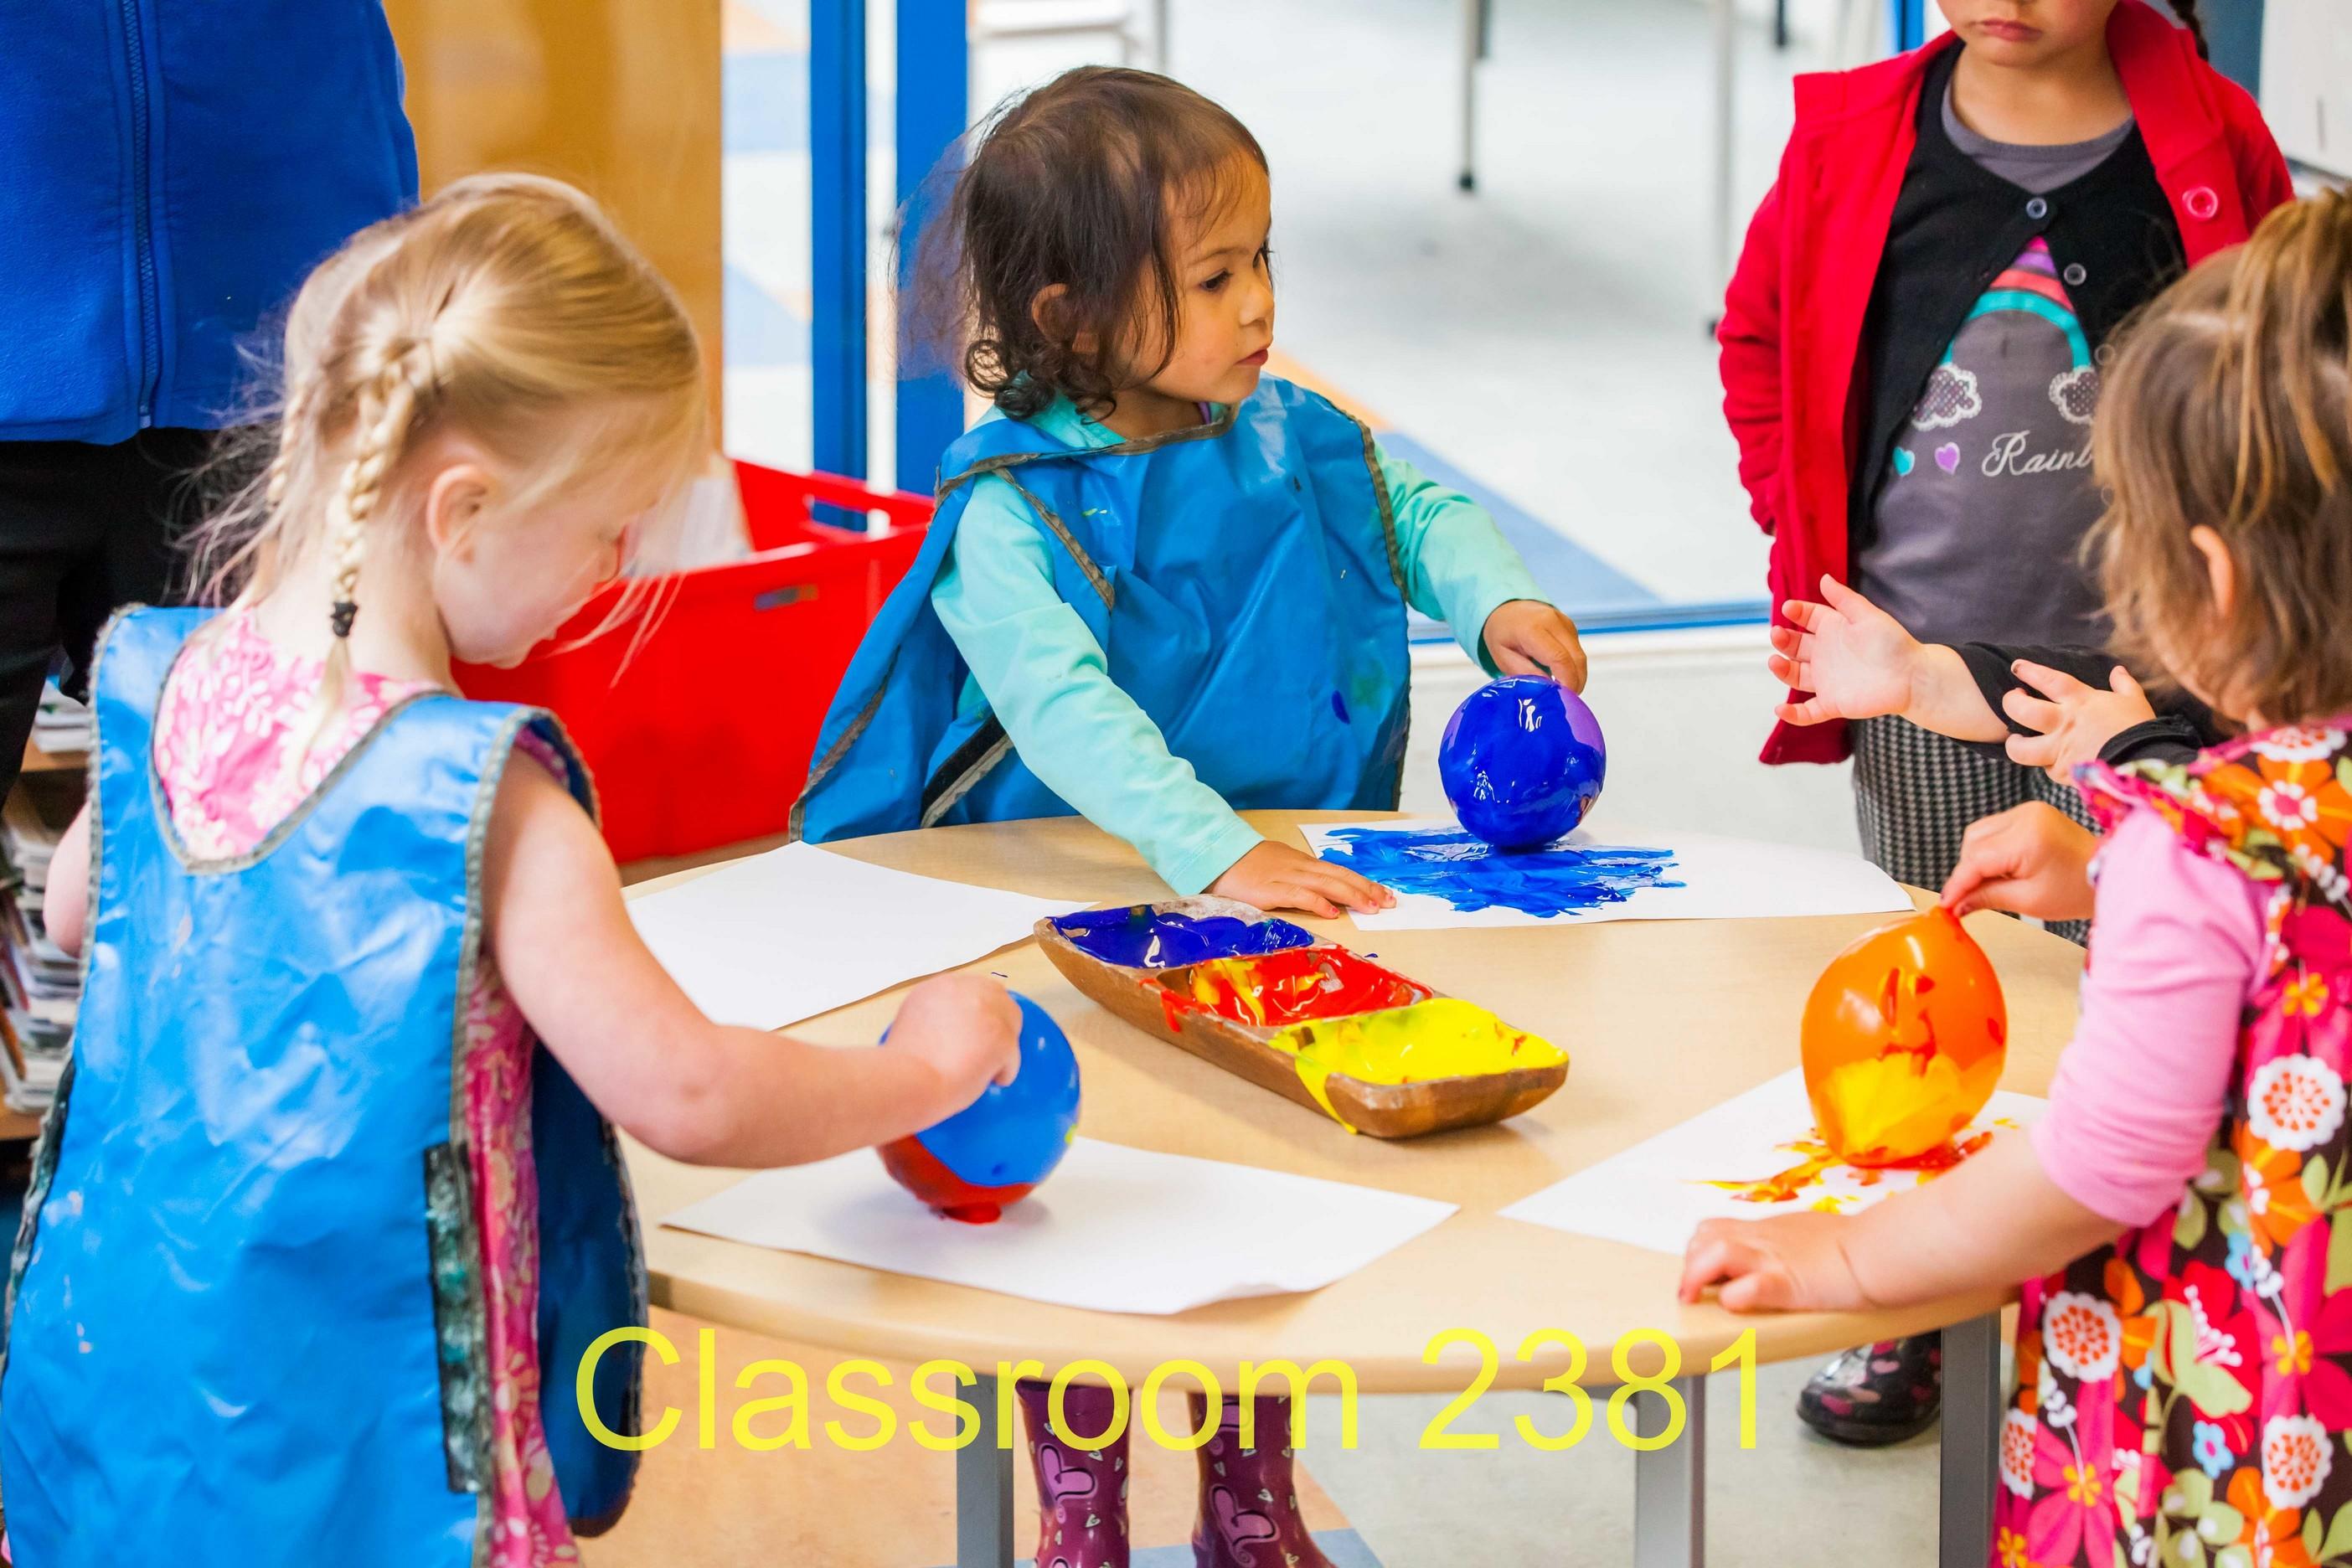 Classroom 2381